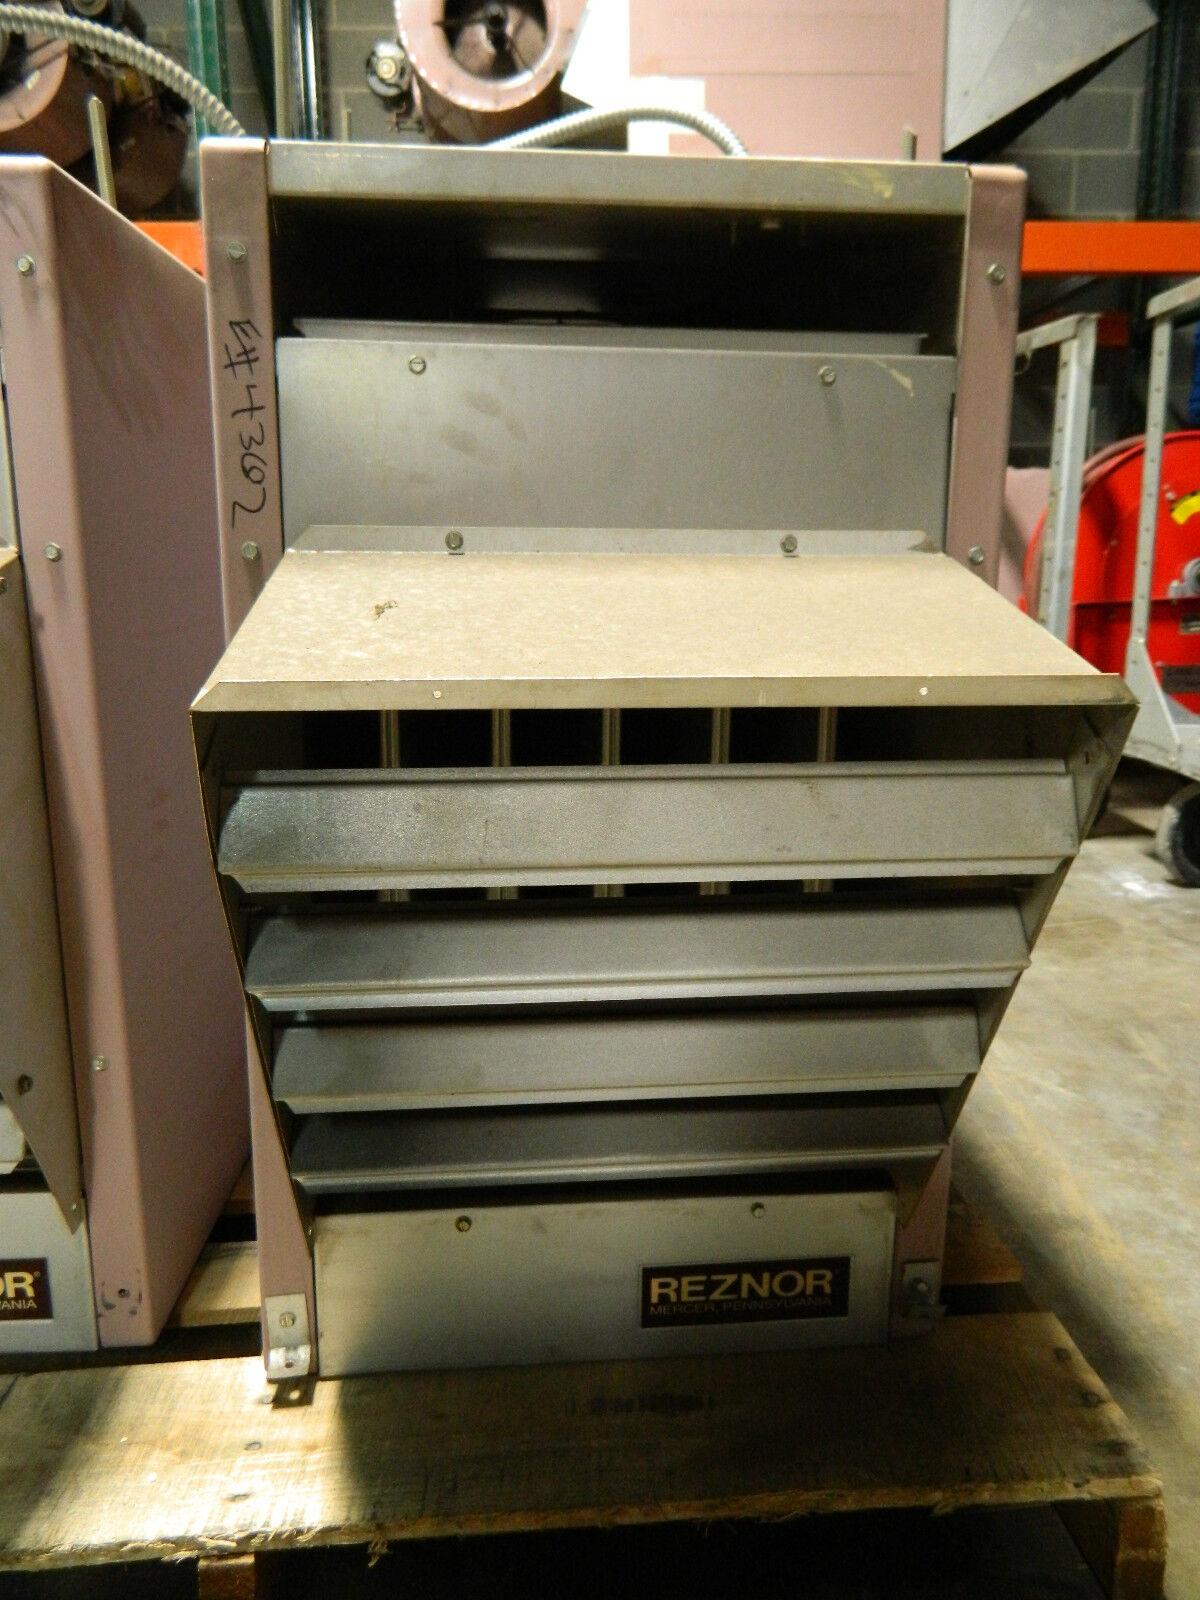 reznor garage heater hot dawg 45 btu natural gas garage ceiling heater - Natural Gas Garage Heater